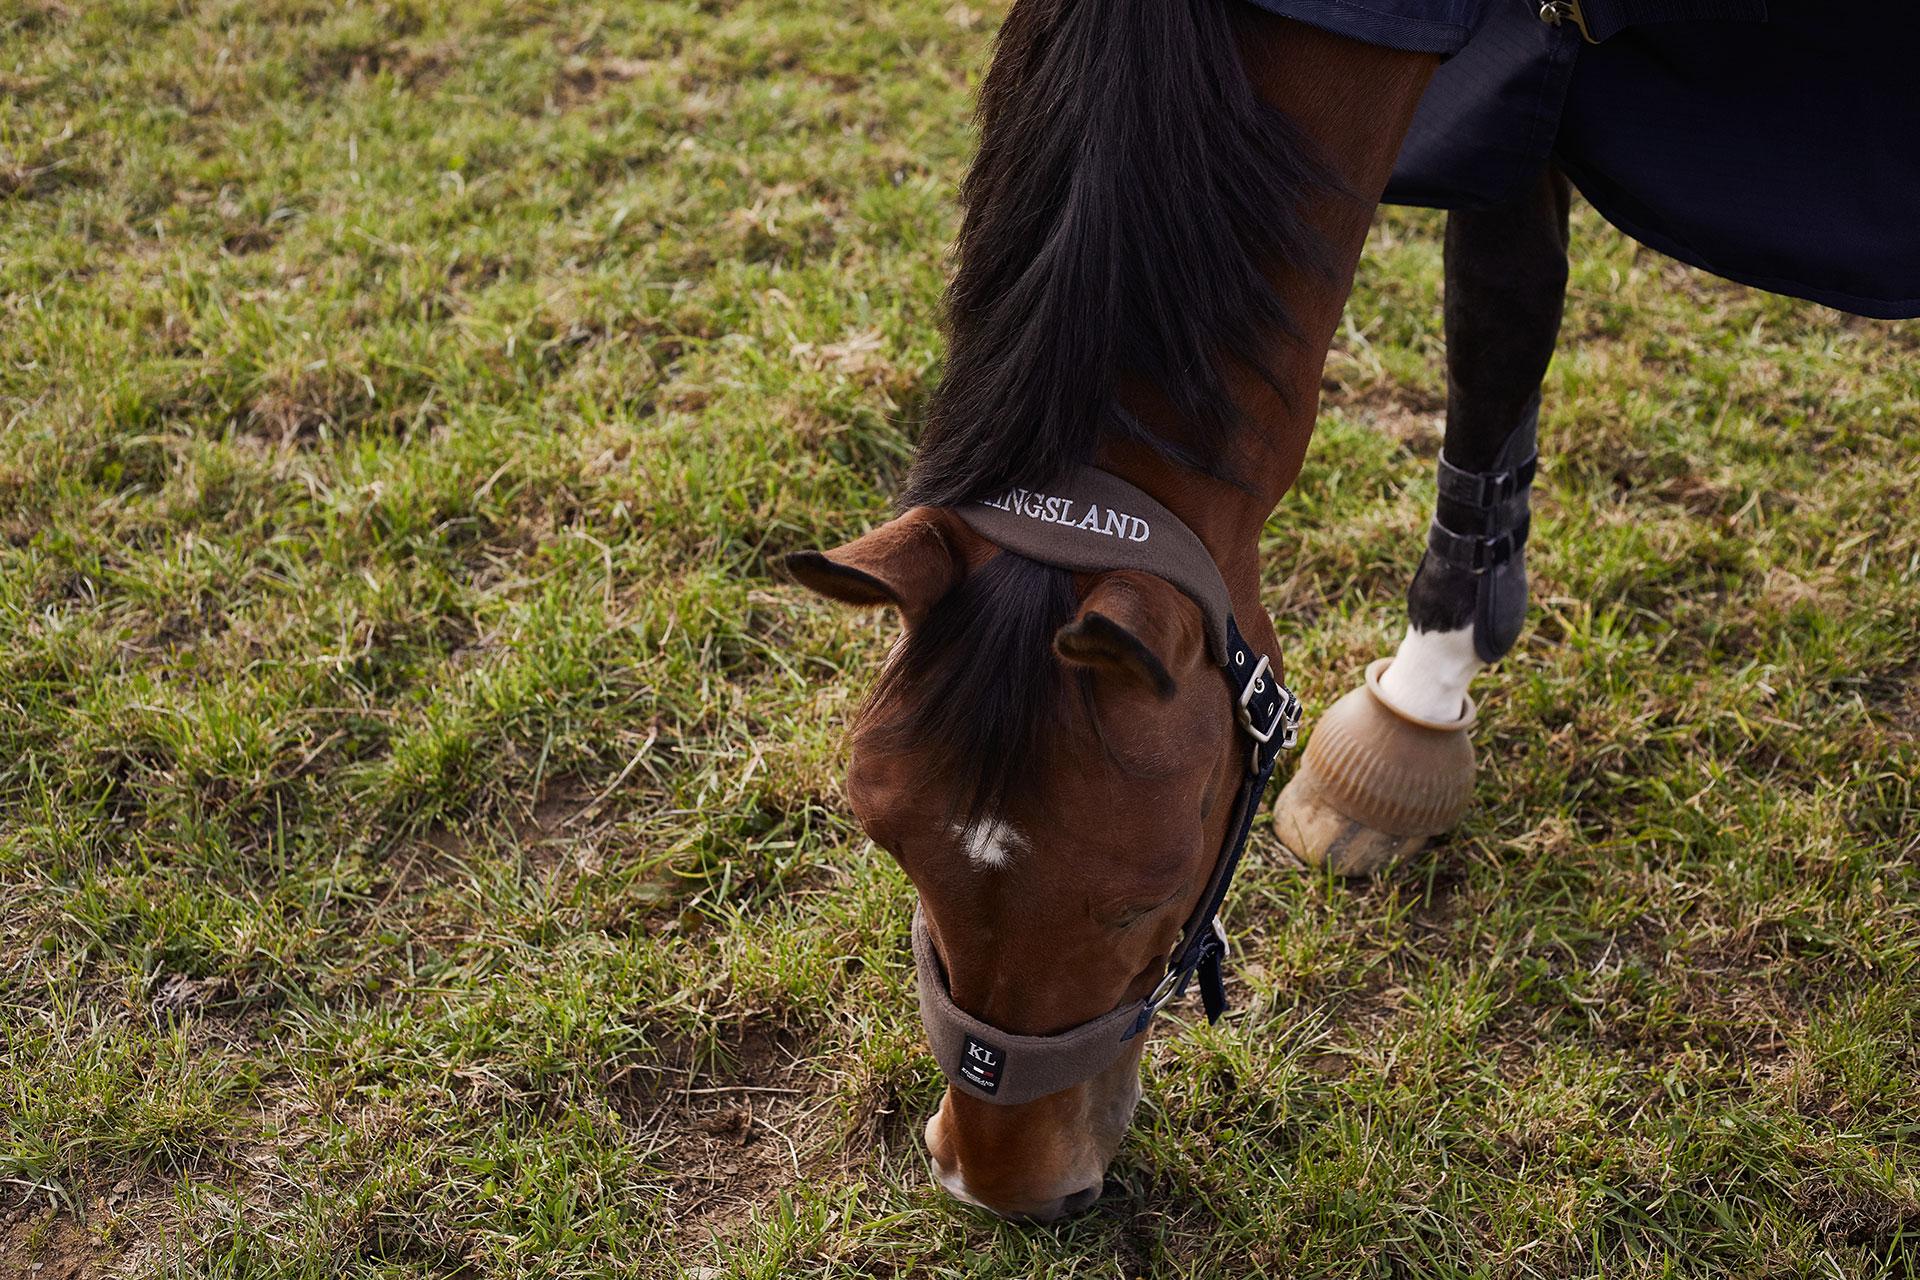 KINGSLAND FABULOUS HORSE GEAR